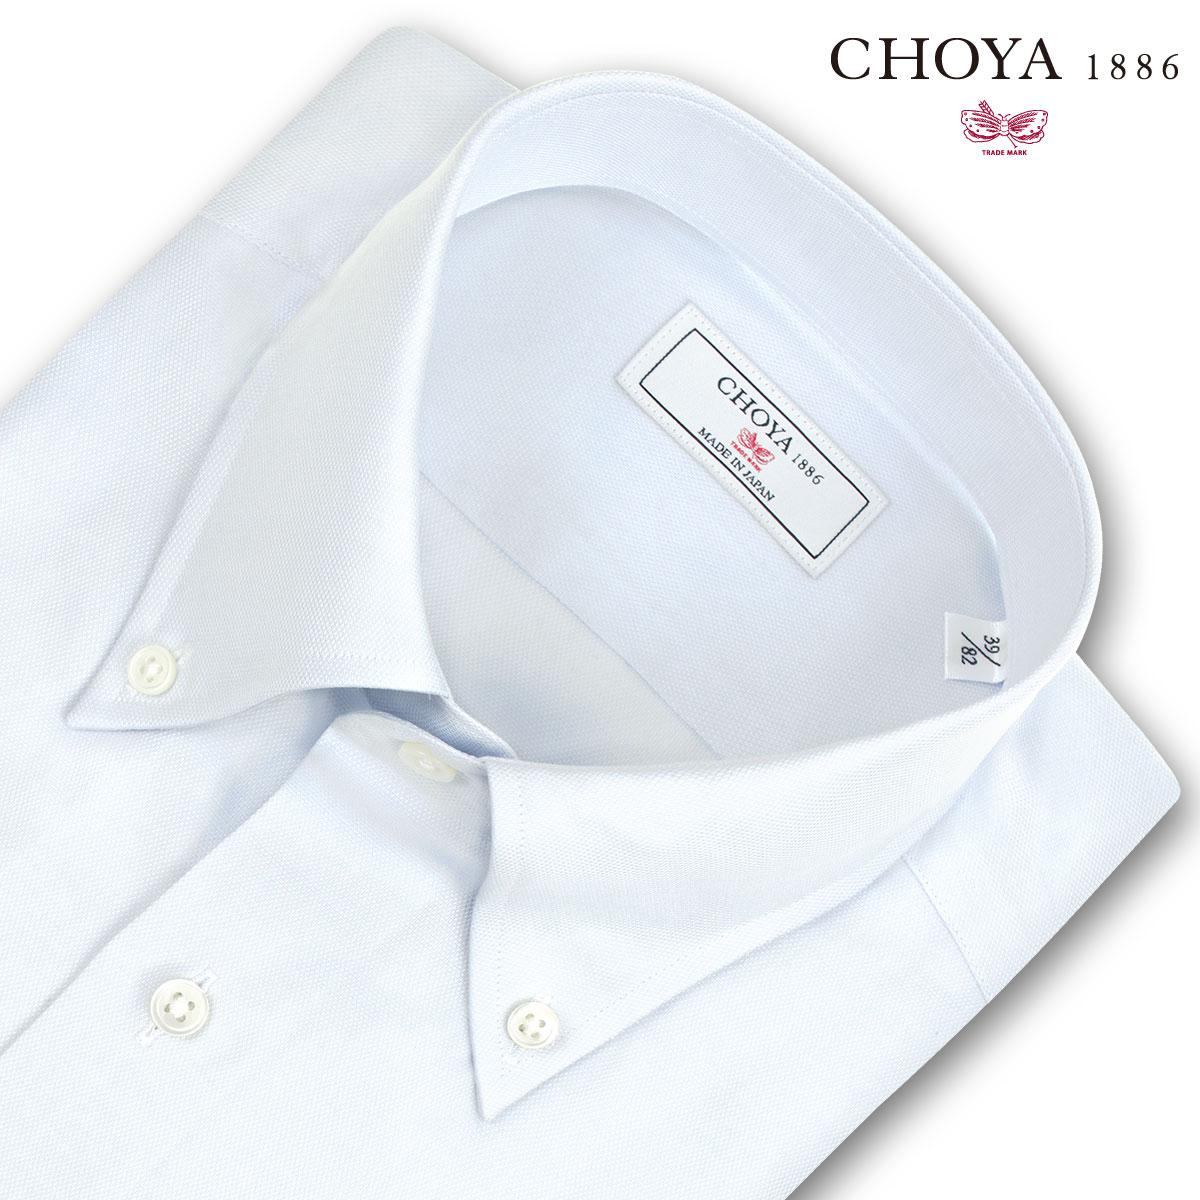 CHOYA 1886 J∞QUALITY認定商品 長袖 ワイシャツ メンズ 春夏秋冬 綿100% 日本製生地 日本縫製 無地調ブルードビー ボタンダウンシャツ | 綿:100% ブルー(cvd212-250)(200304des)(200319des)